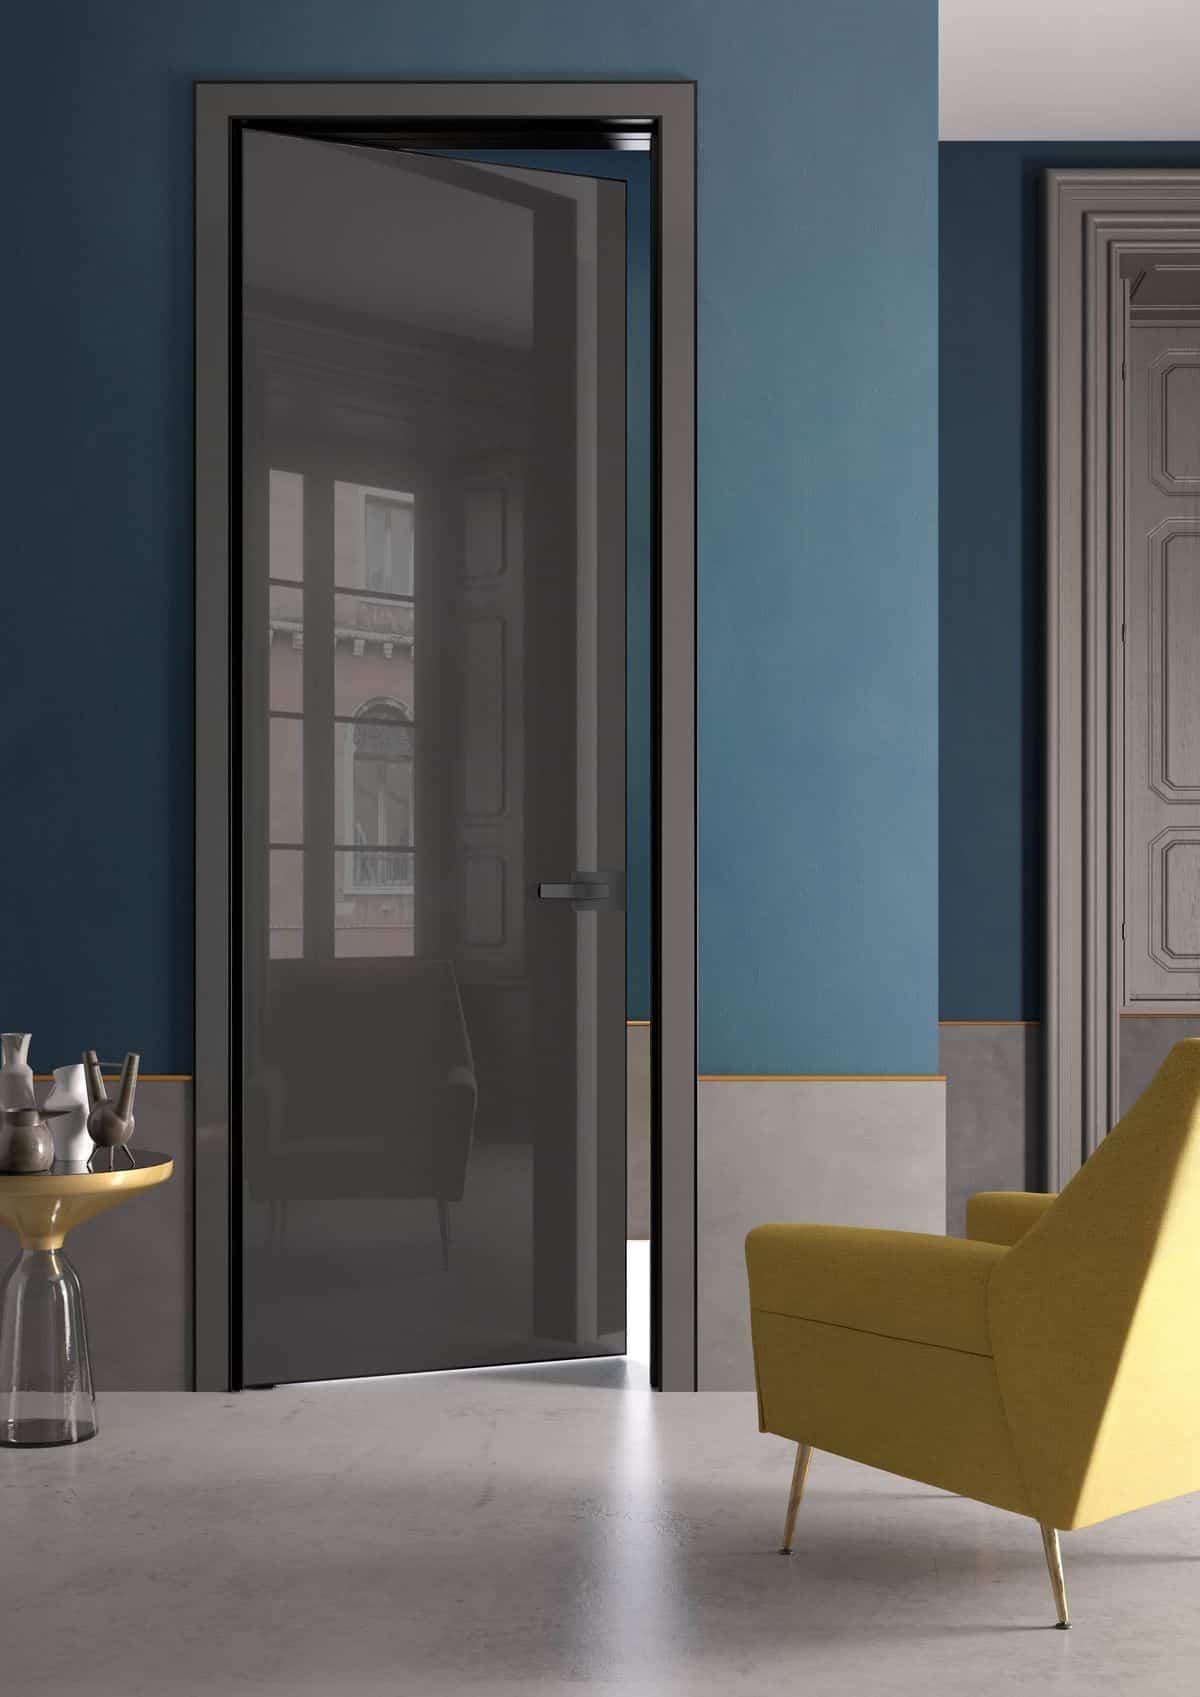 living room door design with grey high gloss laminates